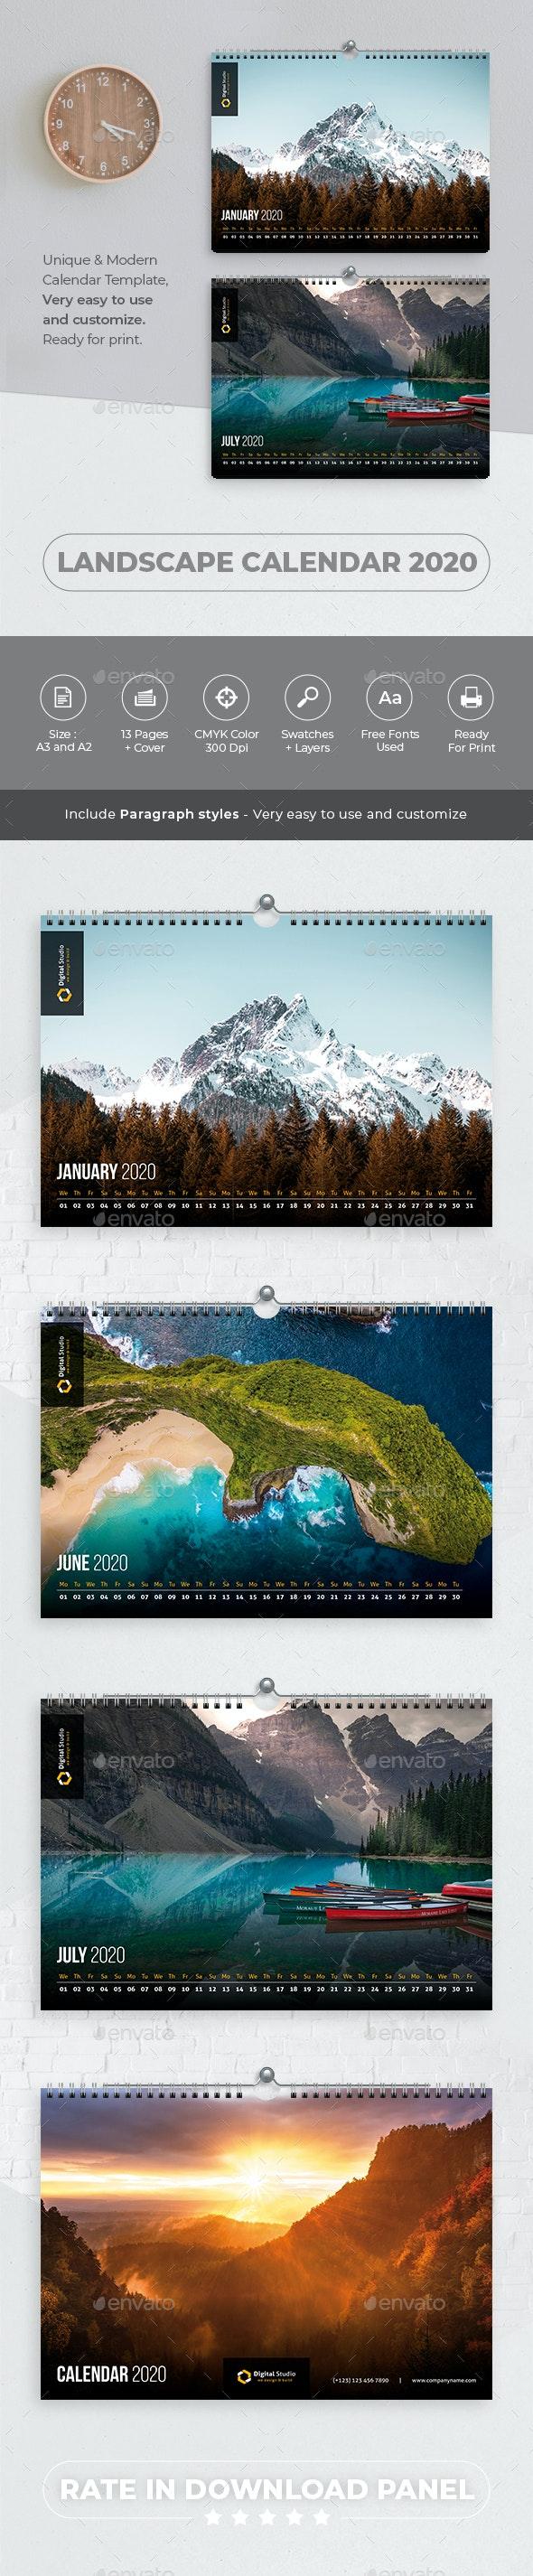 Landscape Calendar 2020 - Calendars Stationery